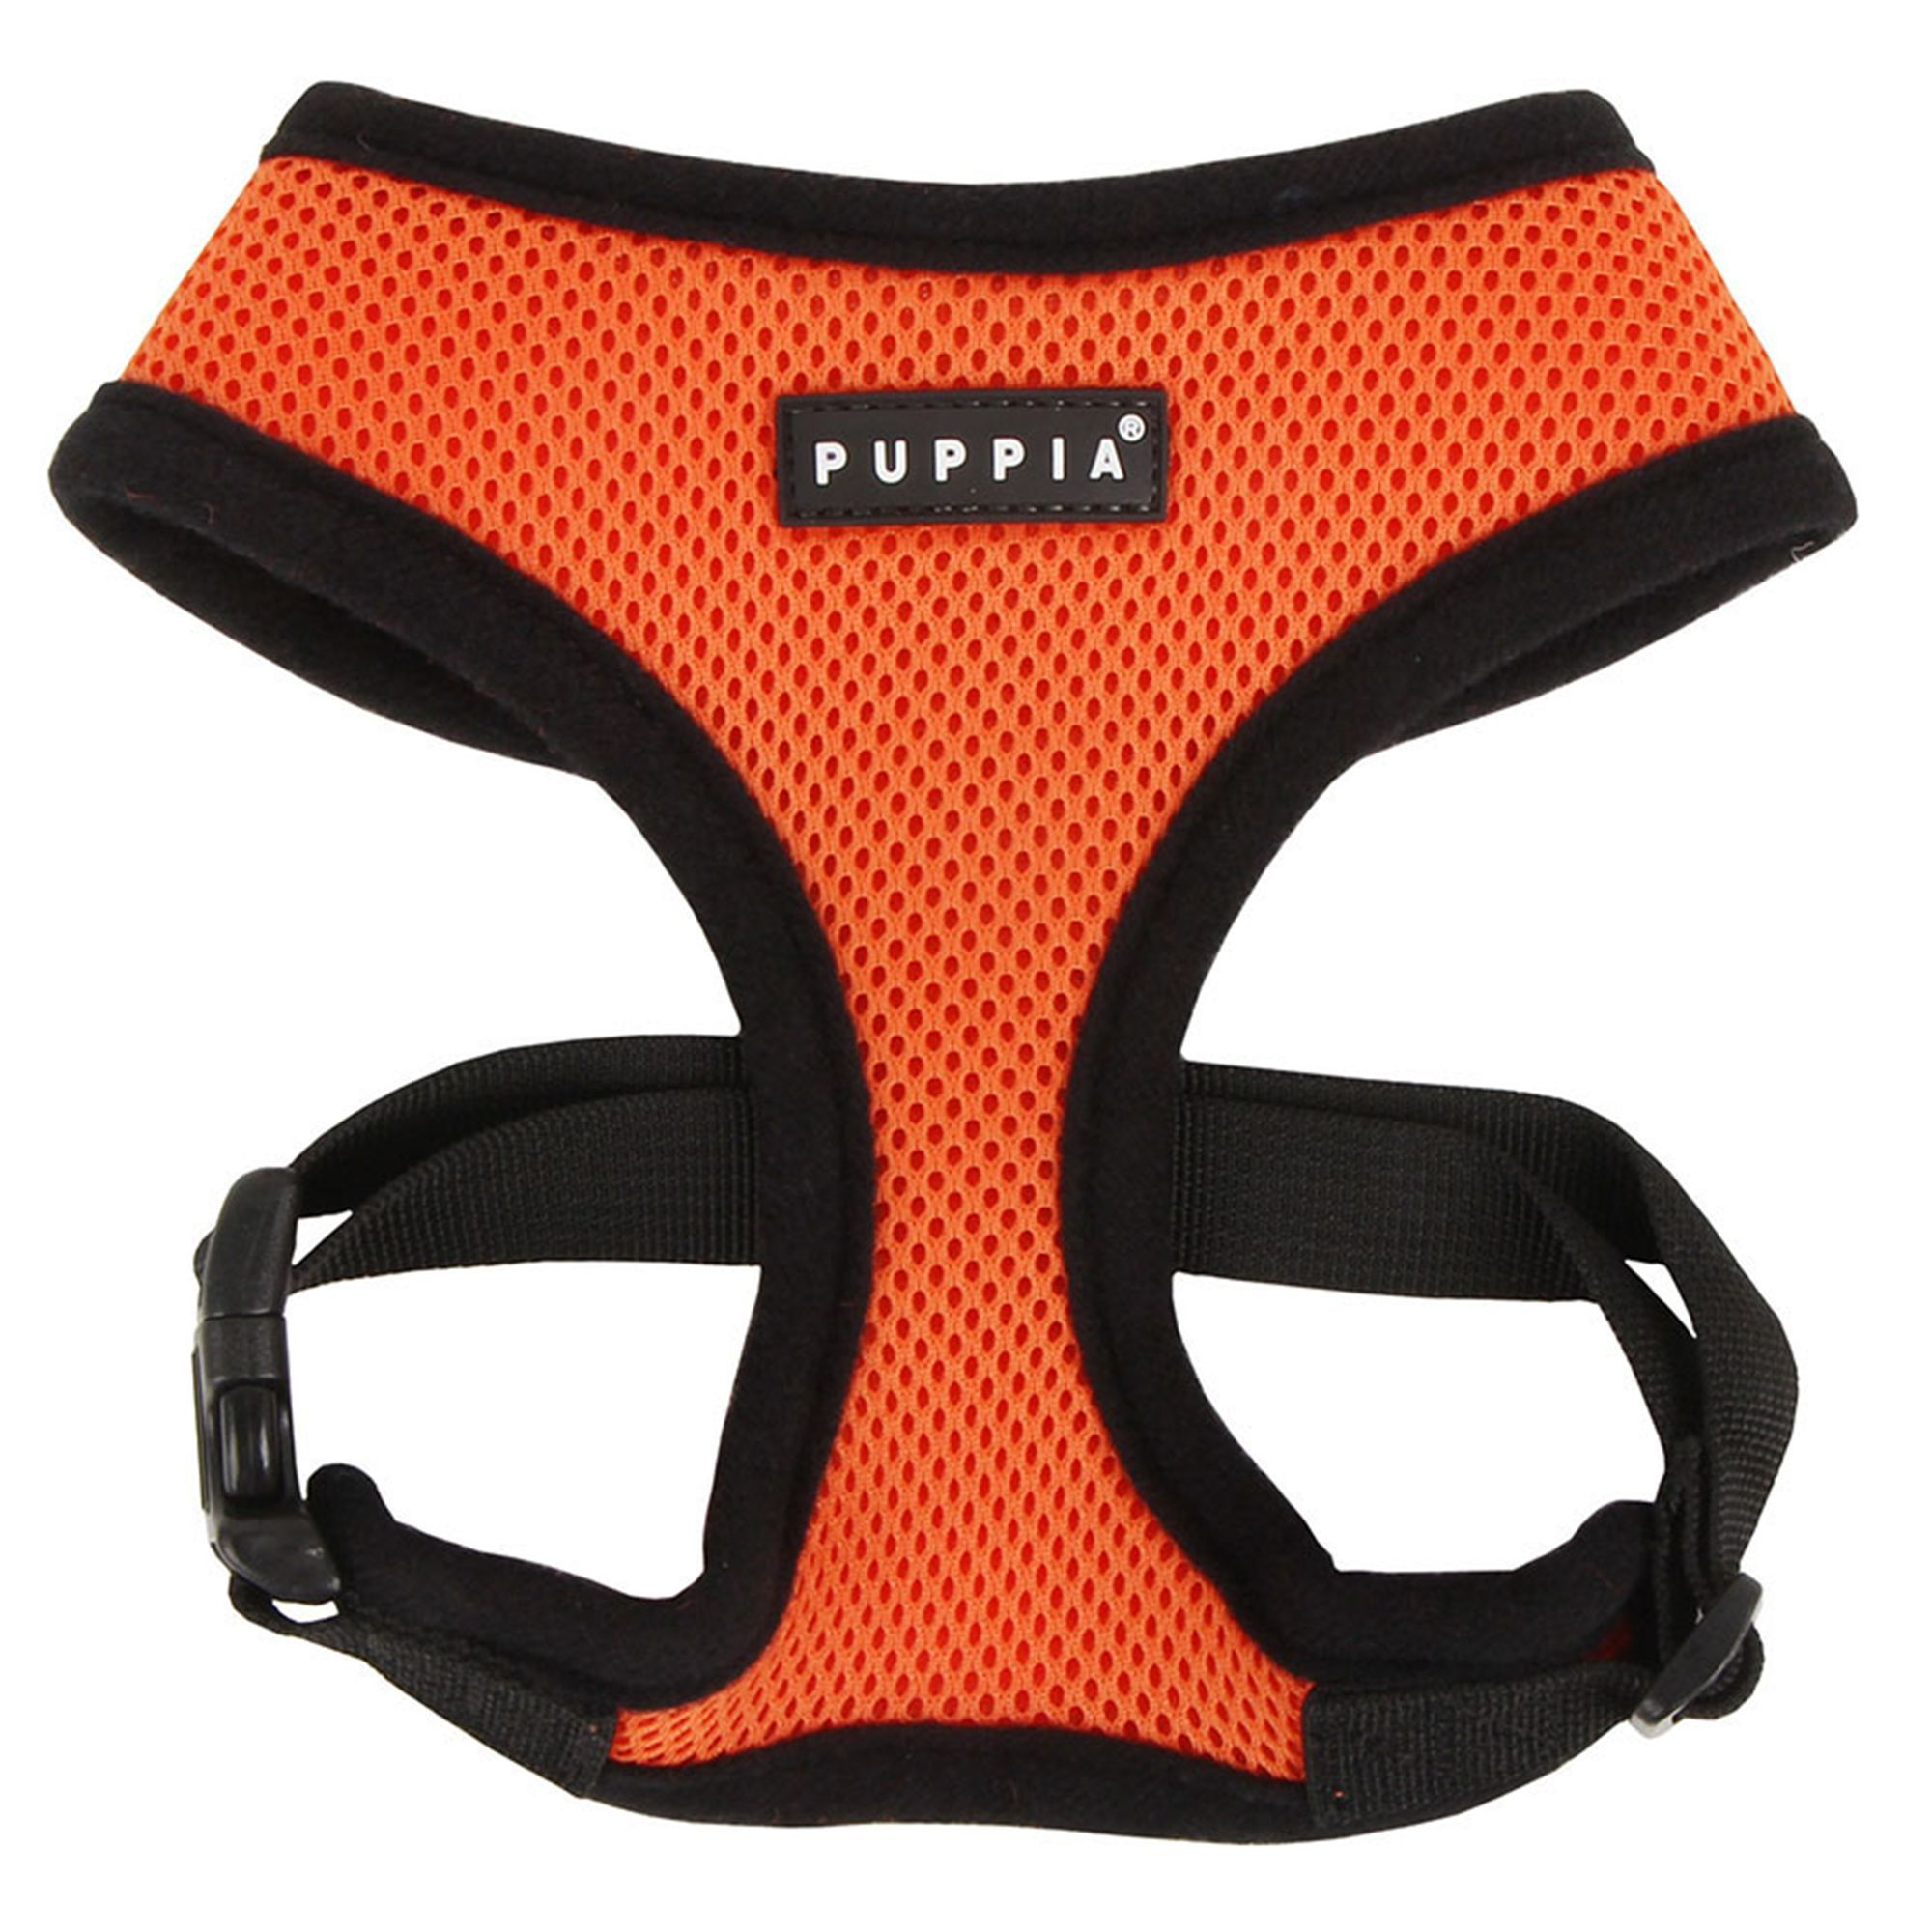 Puppia Soft Adjustable Dog Harness size X Small, Orange